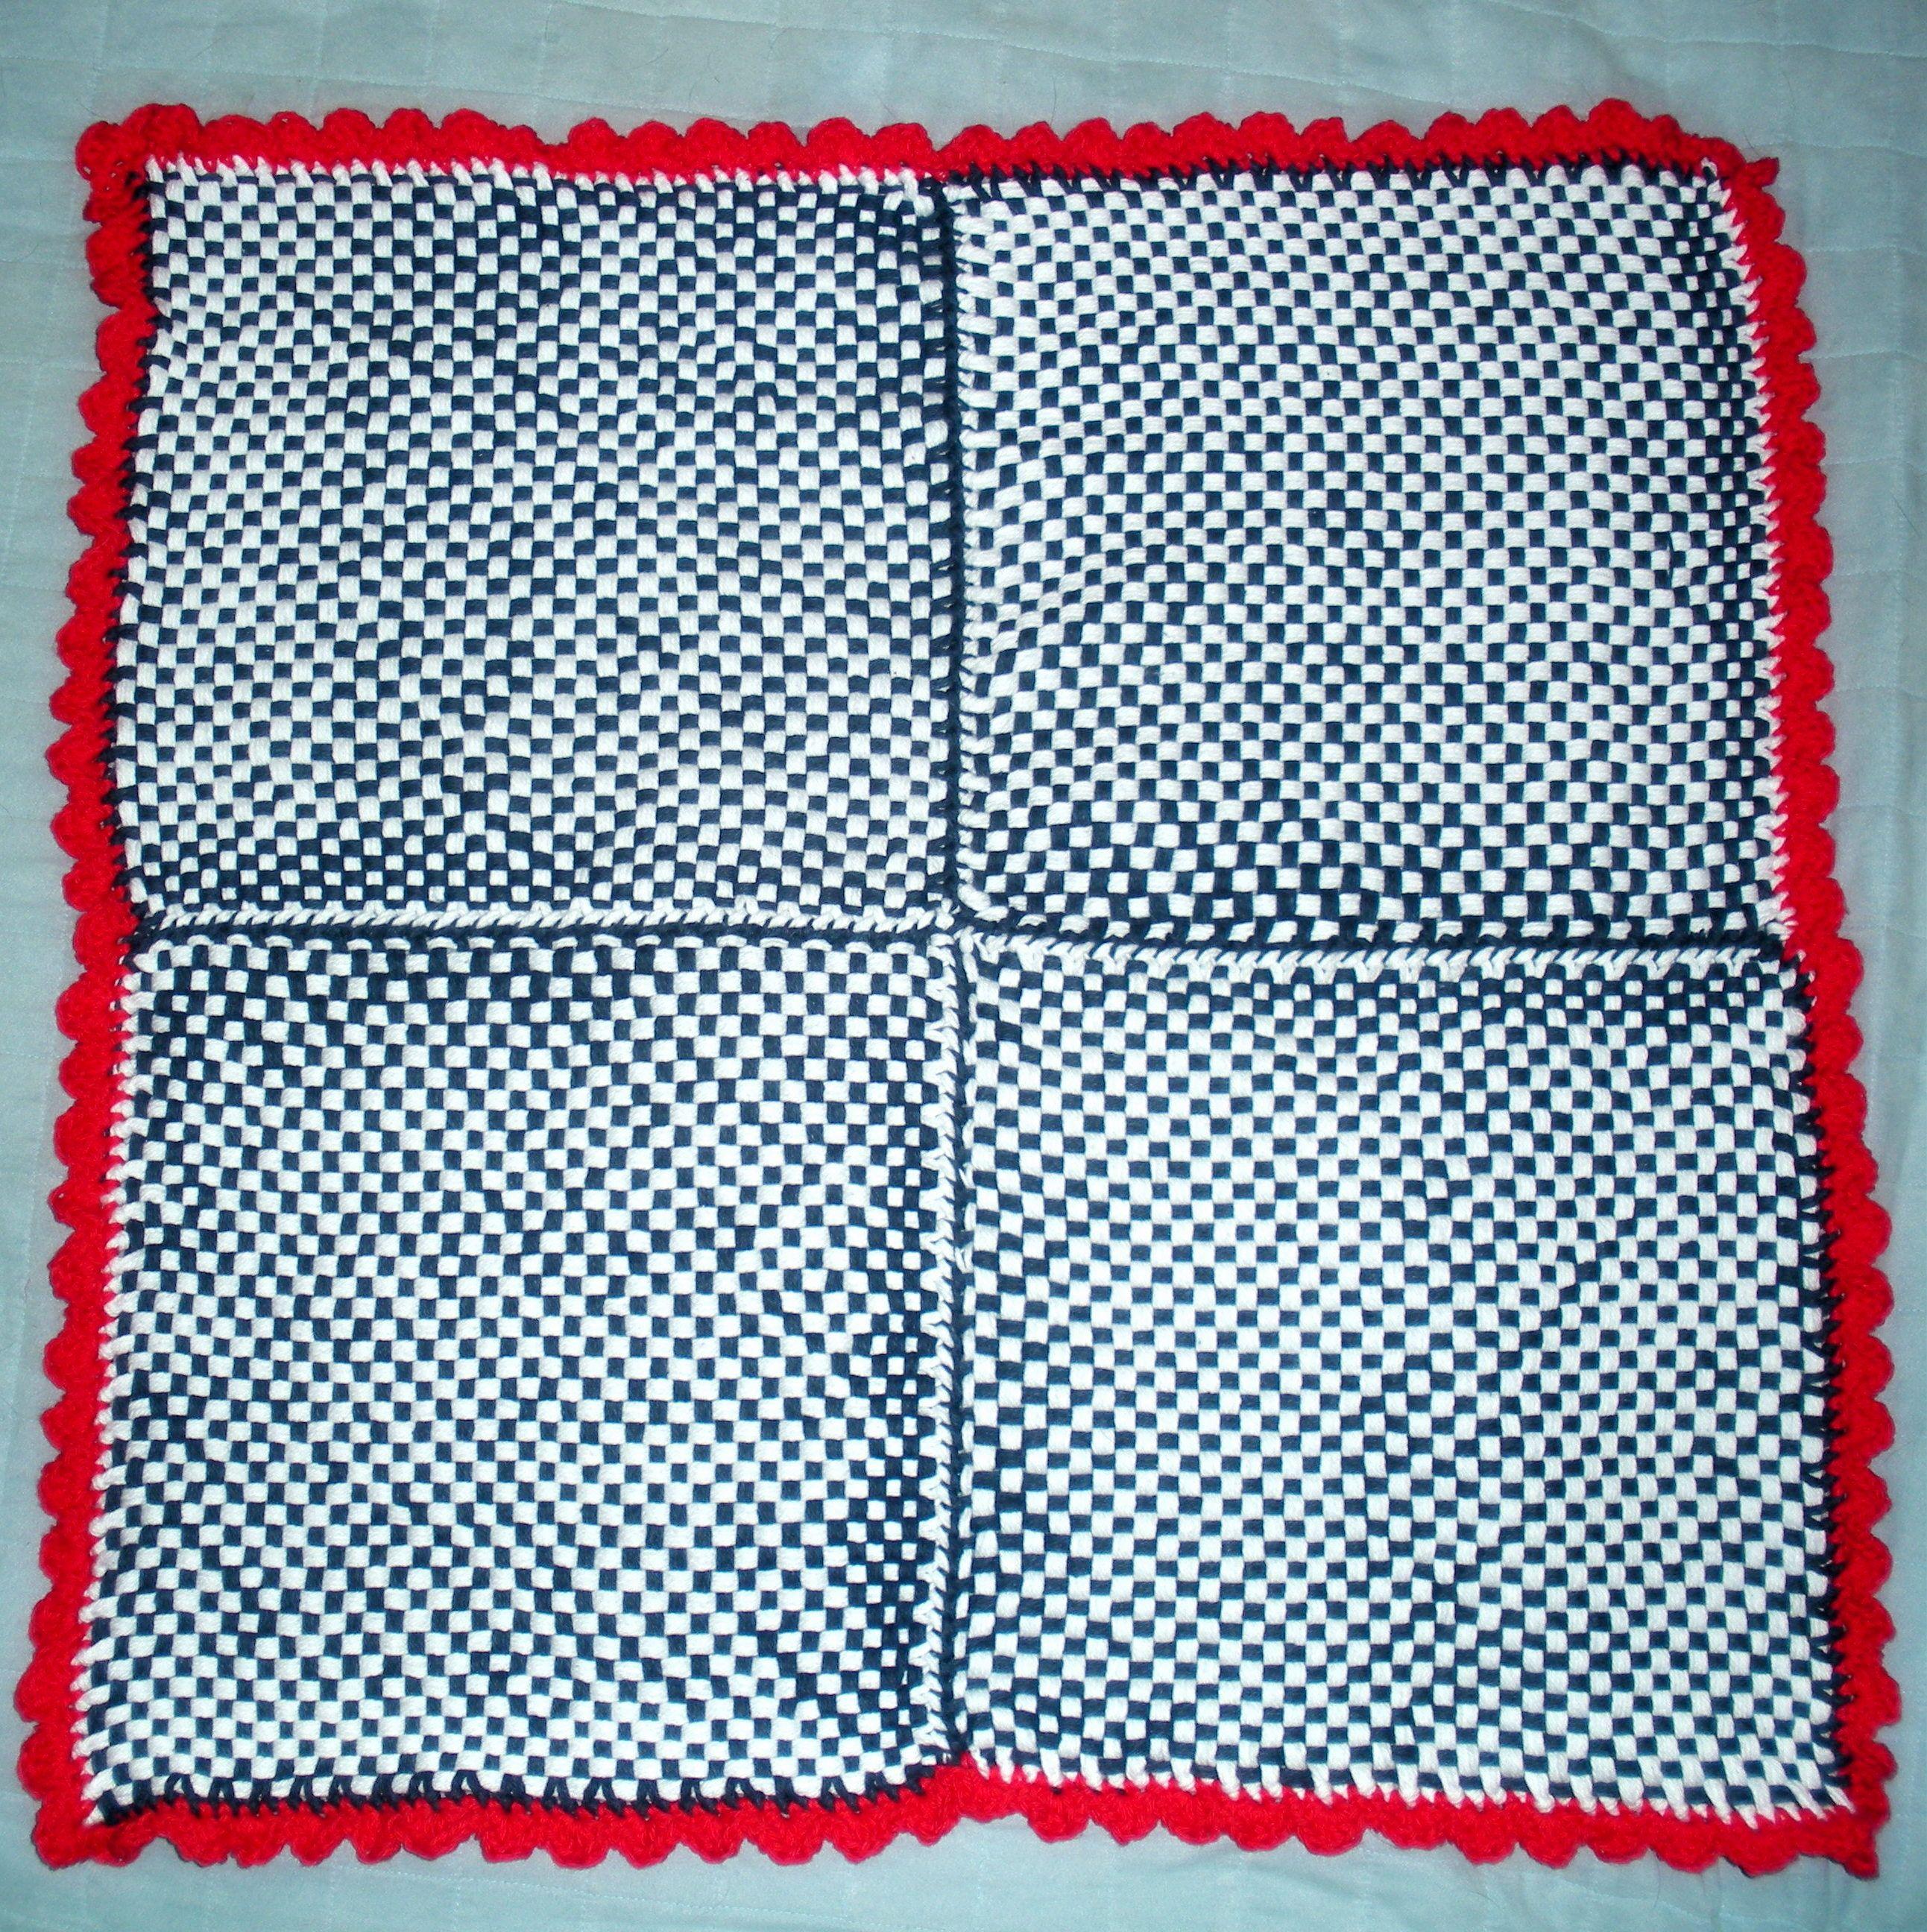 woven baby blanket with crochet ruffle trim - Martha Stewart Loom ... : martha stewart baby quilt - Adamdwight.com